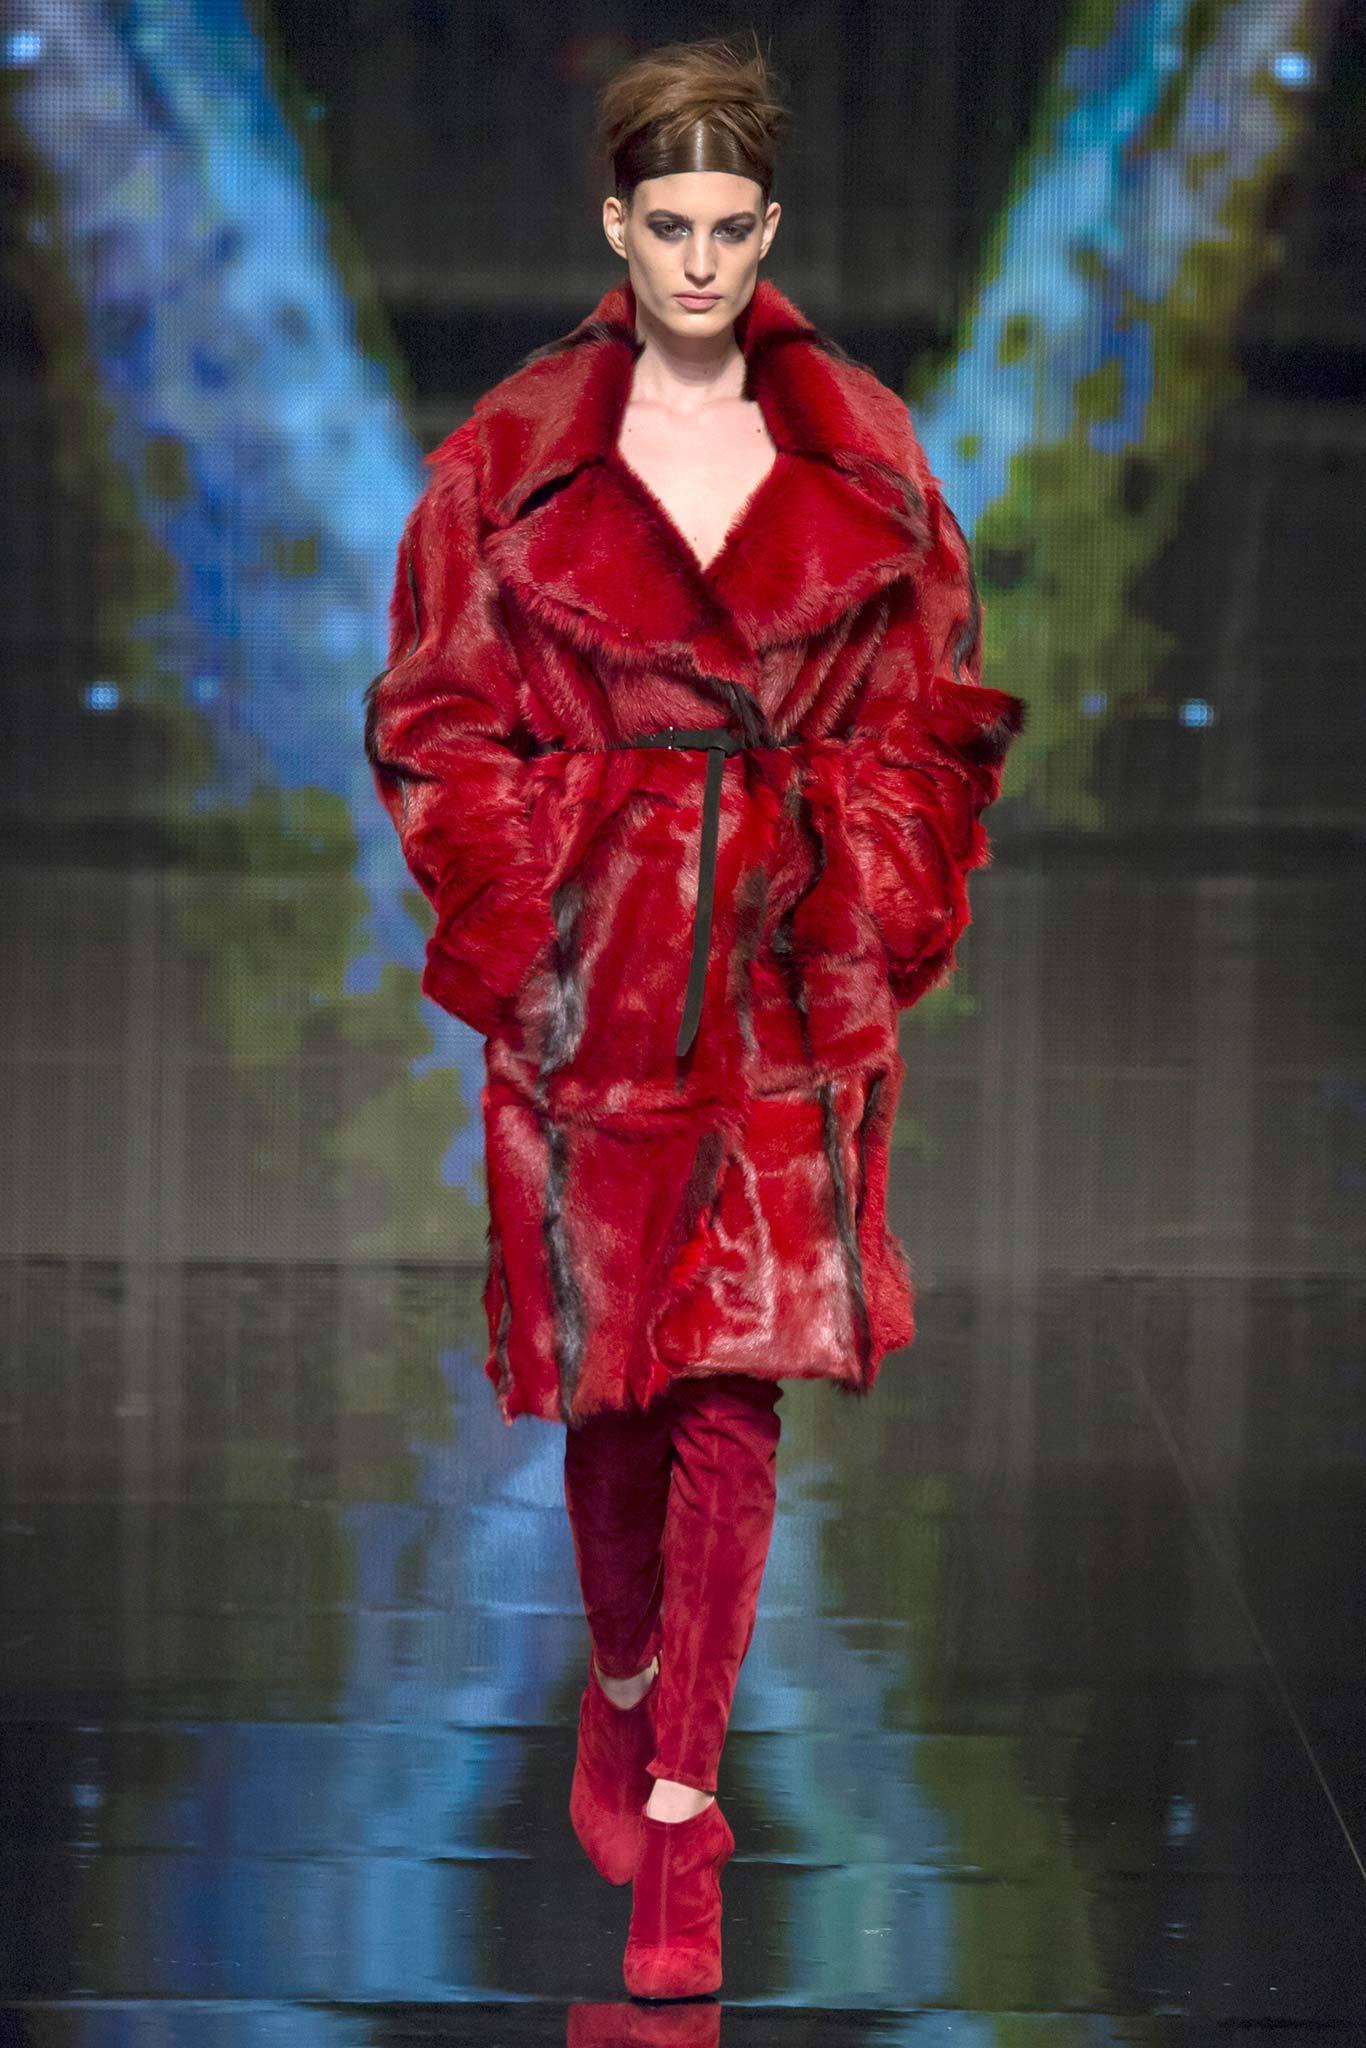 Luxe-Outerwear-in-Donna-Karan-Fall-Winter-2014-2015-6